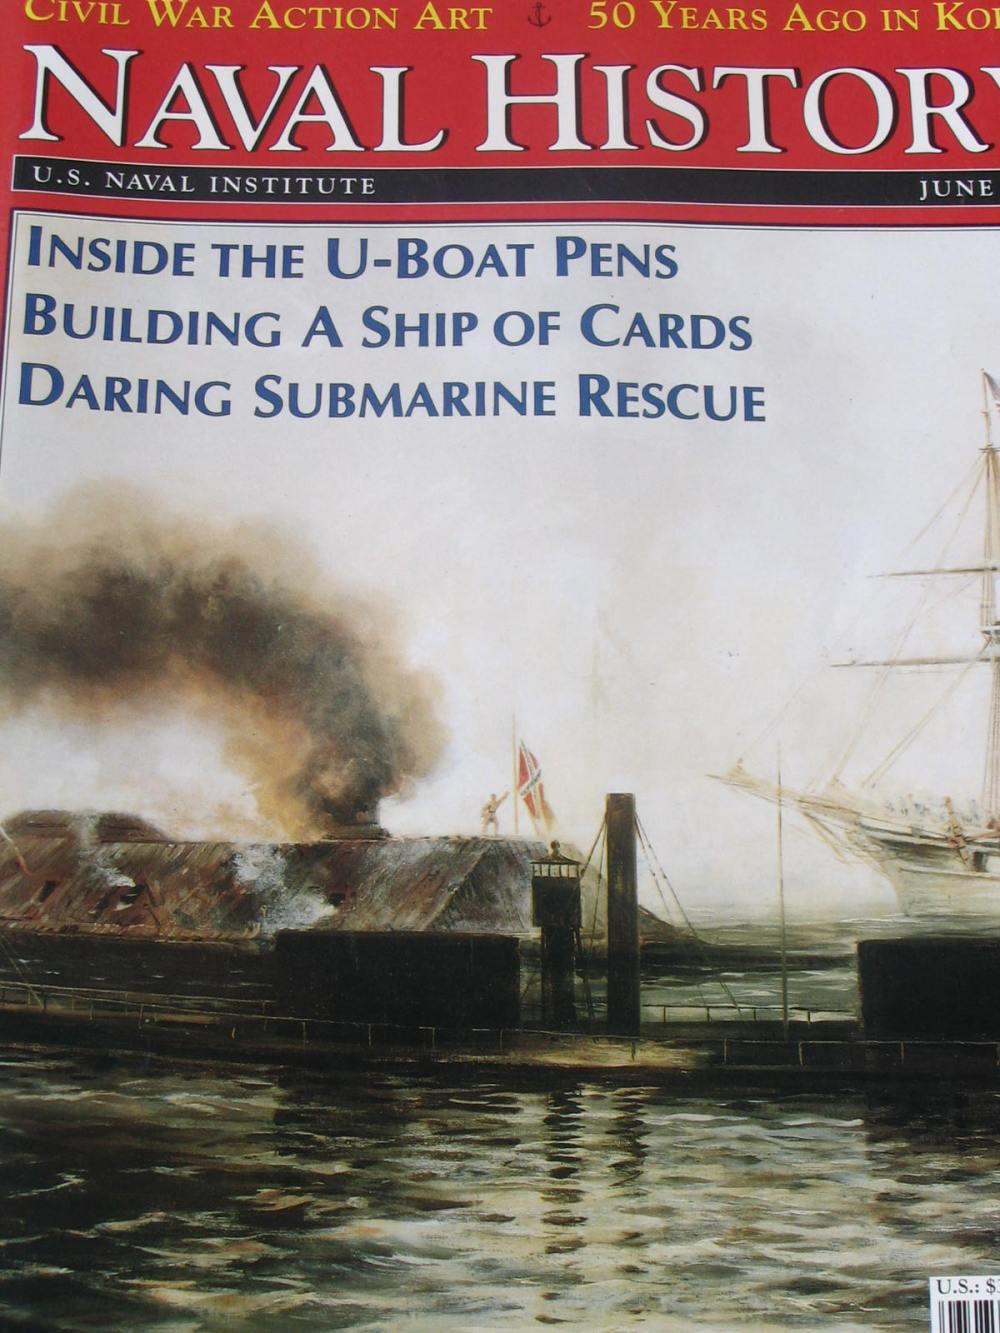 medium resolution of nh uboat cover 1